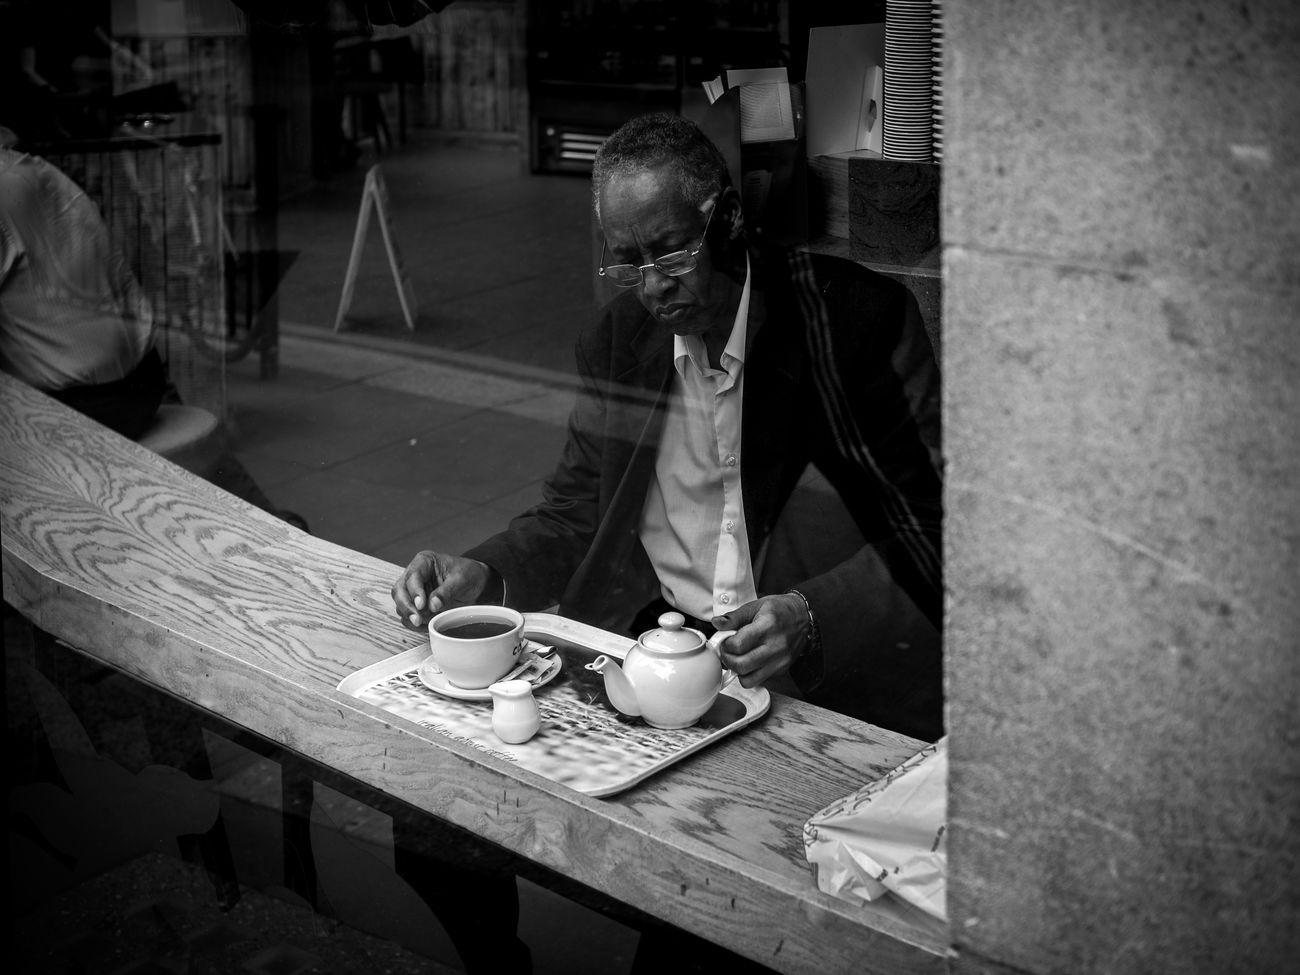 Tea Break. Street Peope Maxgor City Street Photography Maxgor.com Lifestyles London London Lifestyle Prime Lens Olympus Pen-f Olympuspenef Rawstreets Streetphotography Monochrome Photography Blackandwhite Candid Photo Streetphotography_bw Streetphoto_bw 50mm Black And White Boroughtmarket